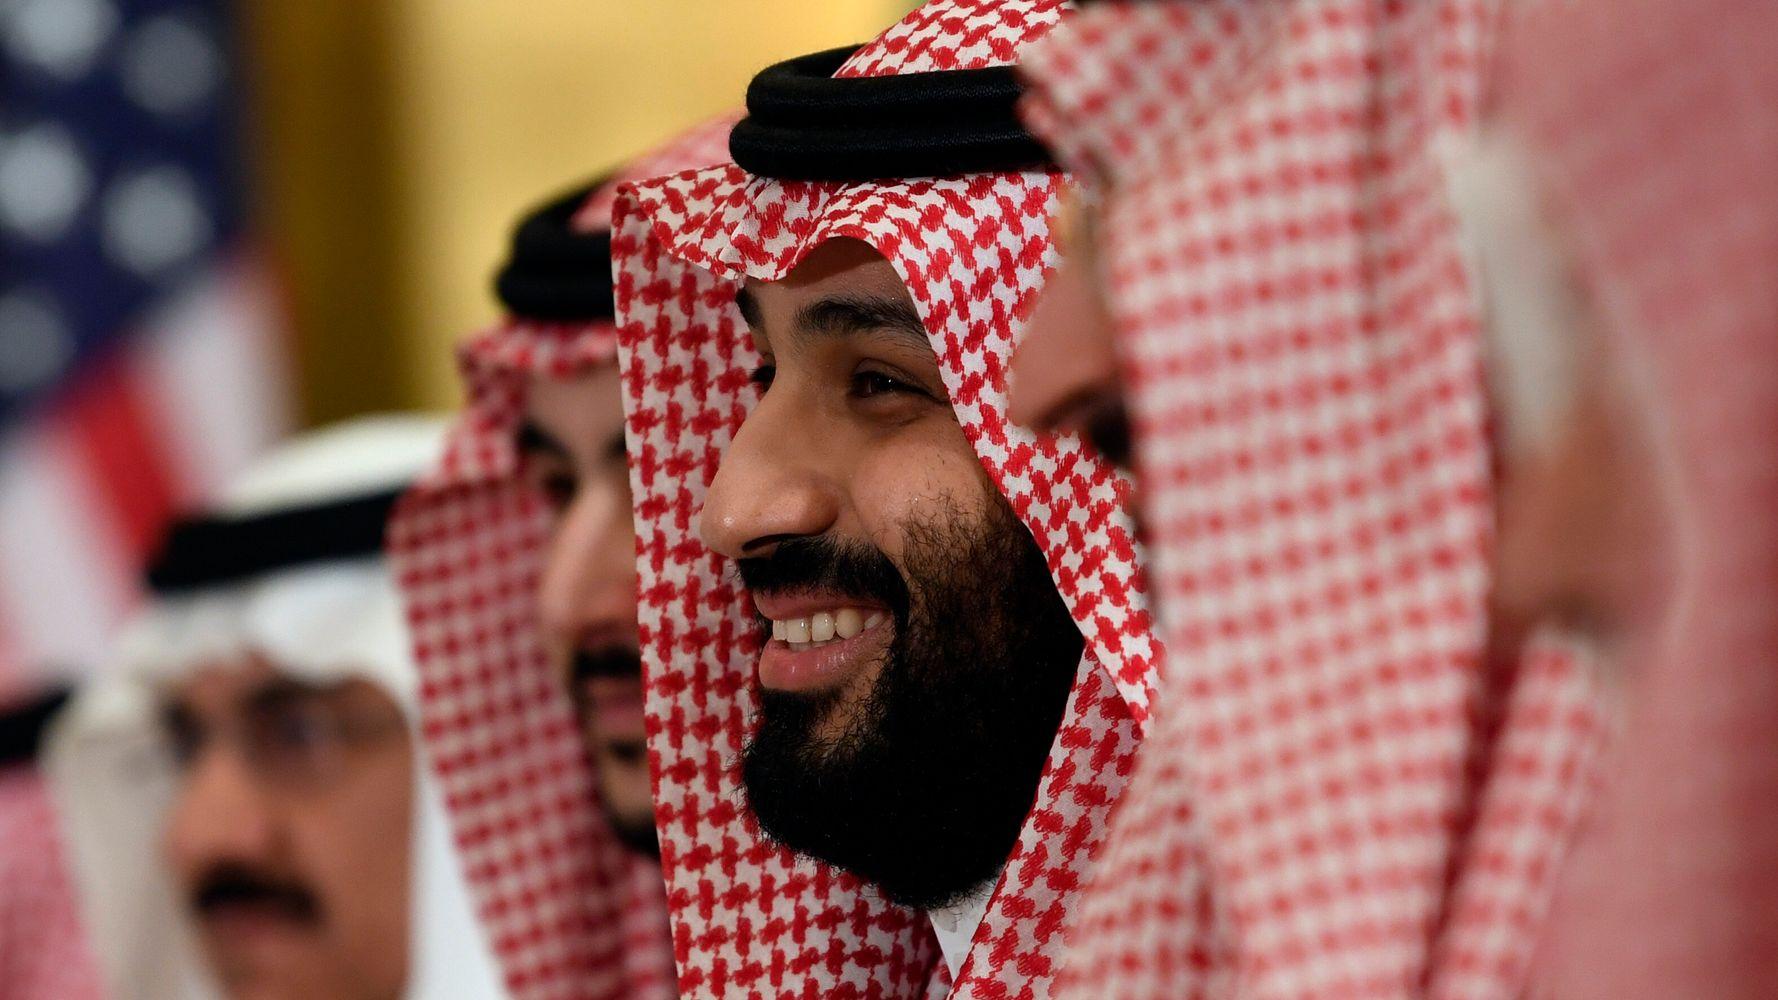 Westlake Legal Group 5d7d4de1230000580553ca40 In Phone Call, Trump Lends Saudi Crown Prince U.S. Support